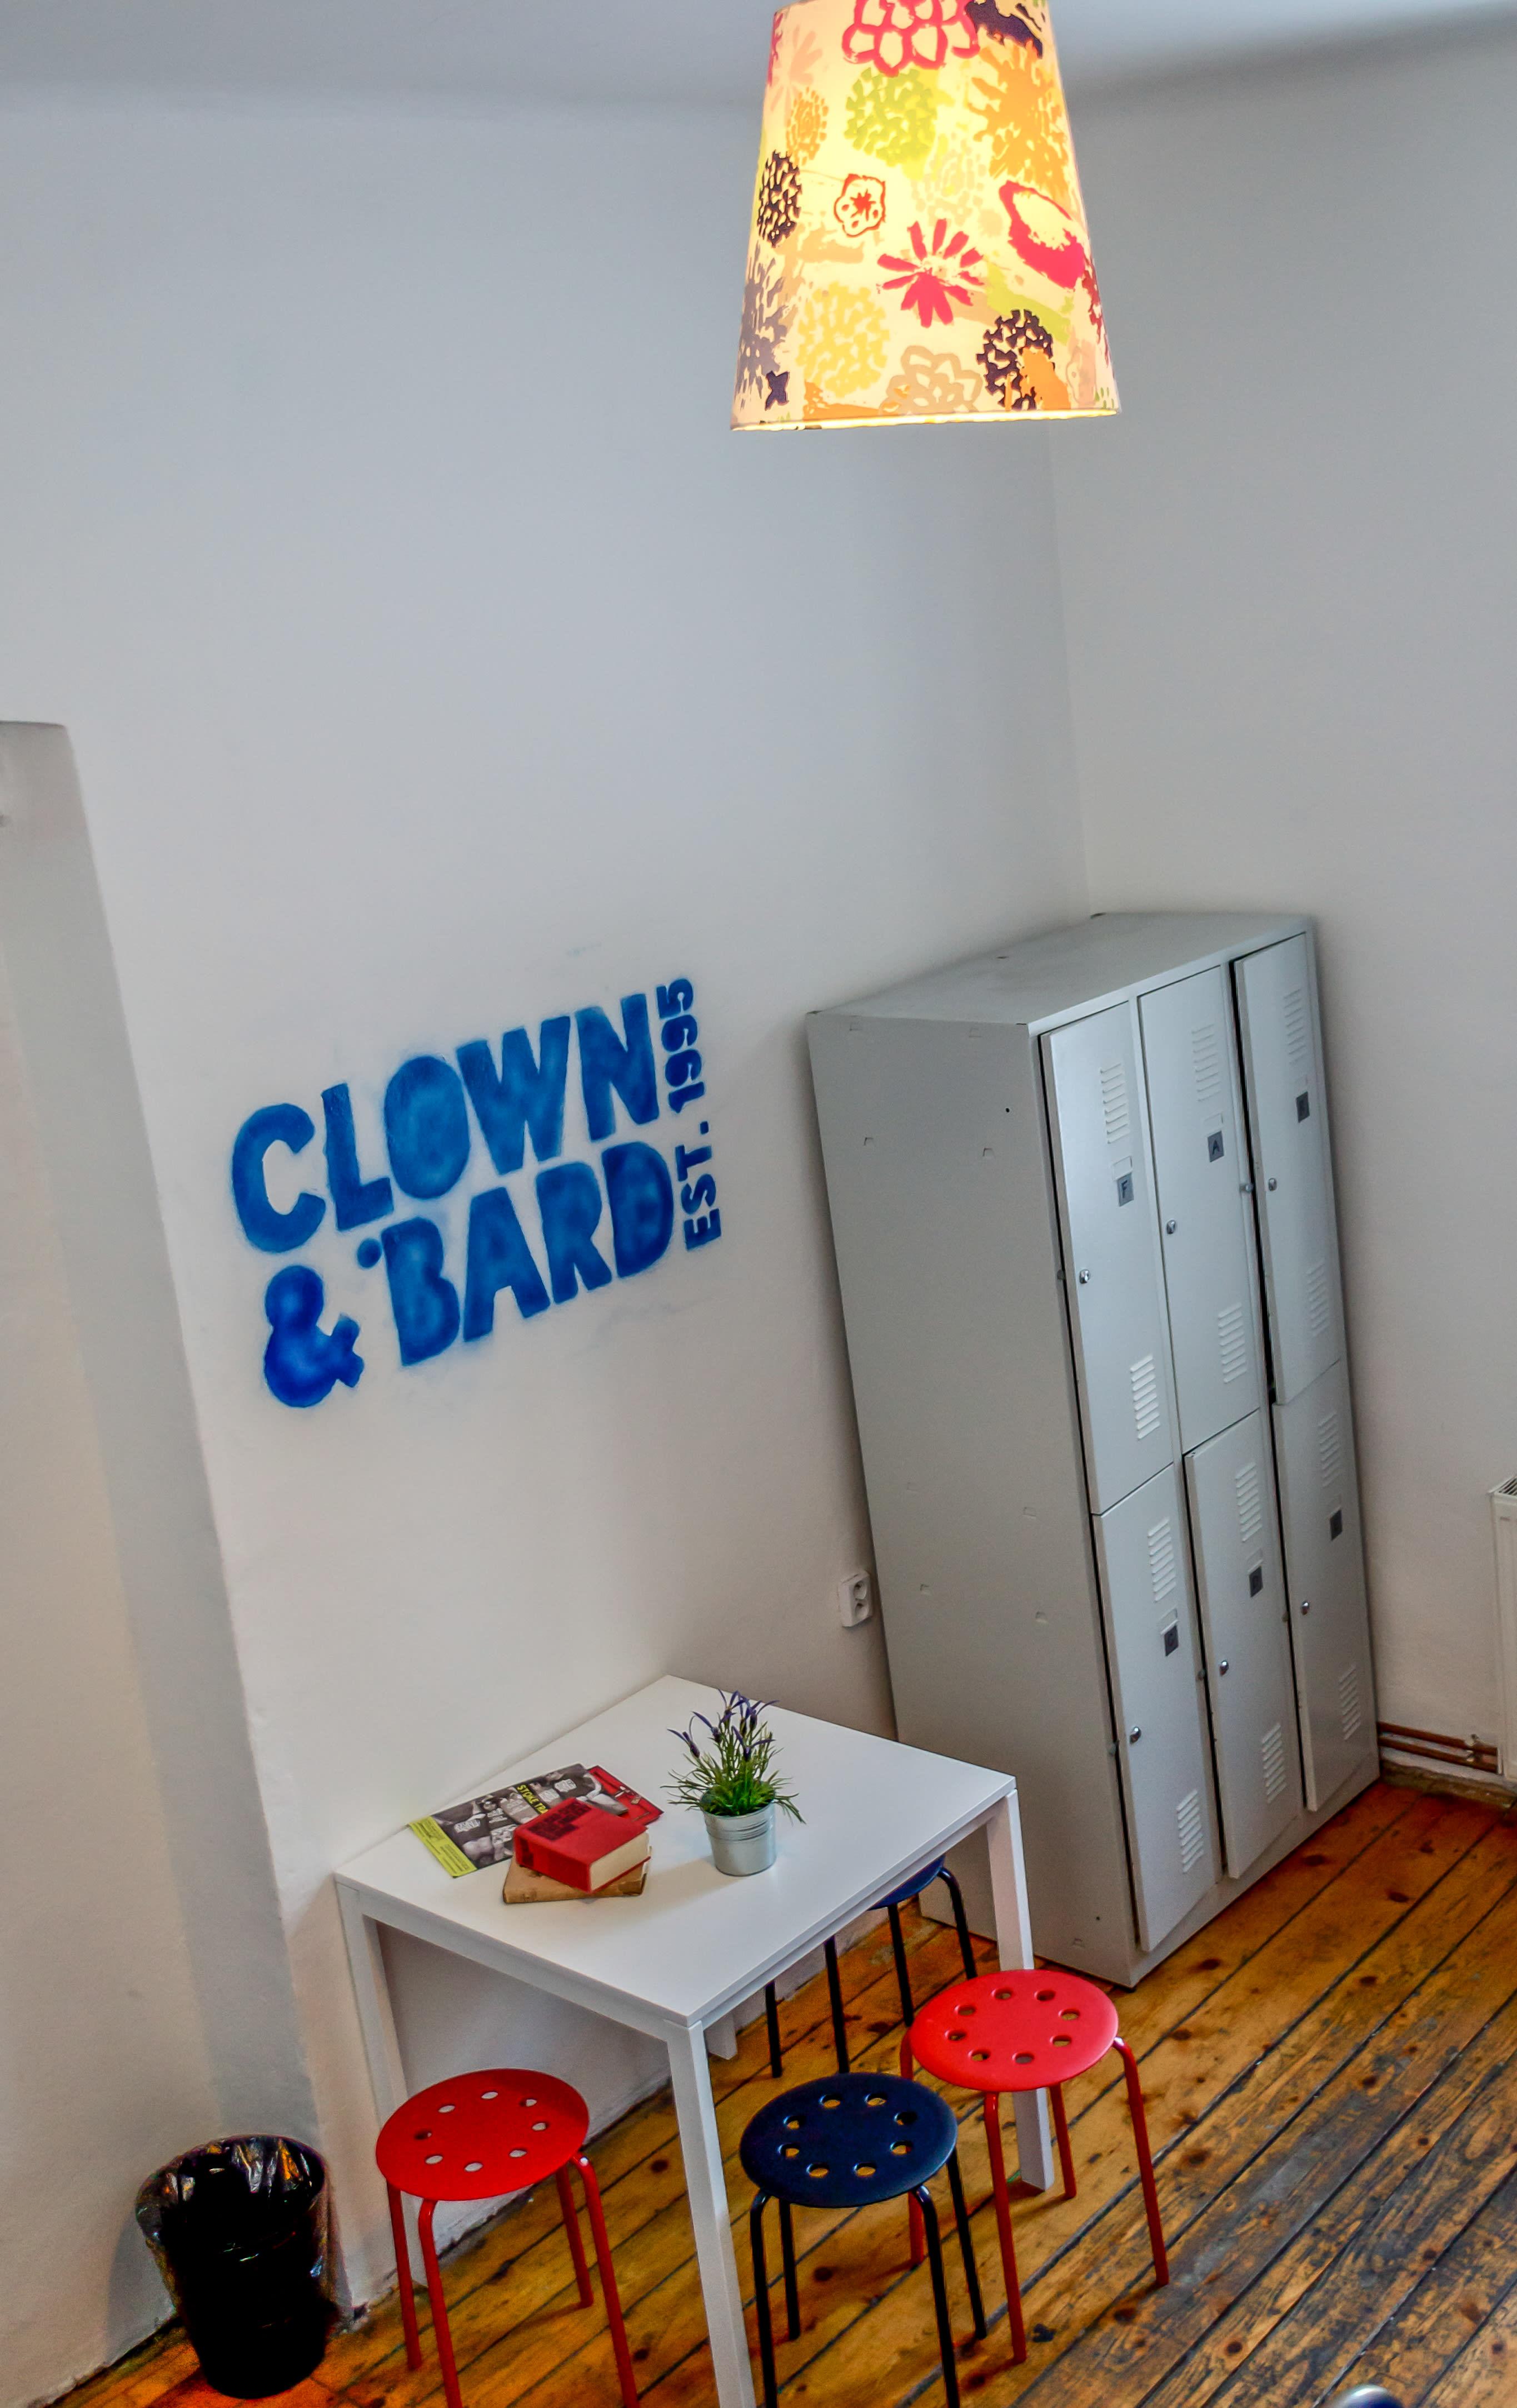 Clown and Bard